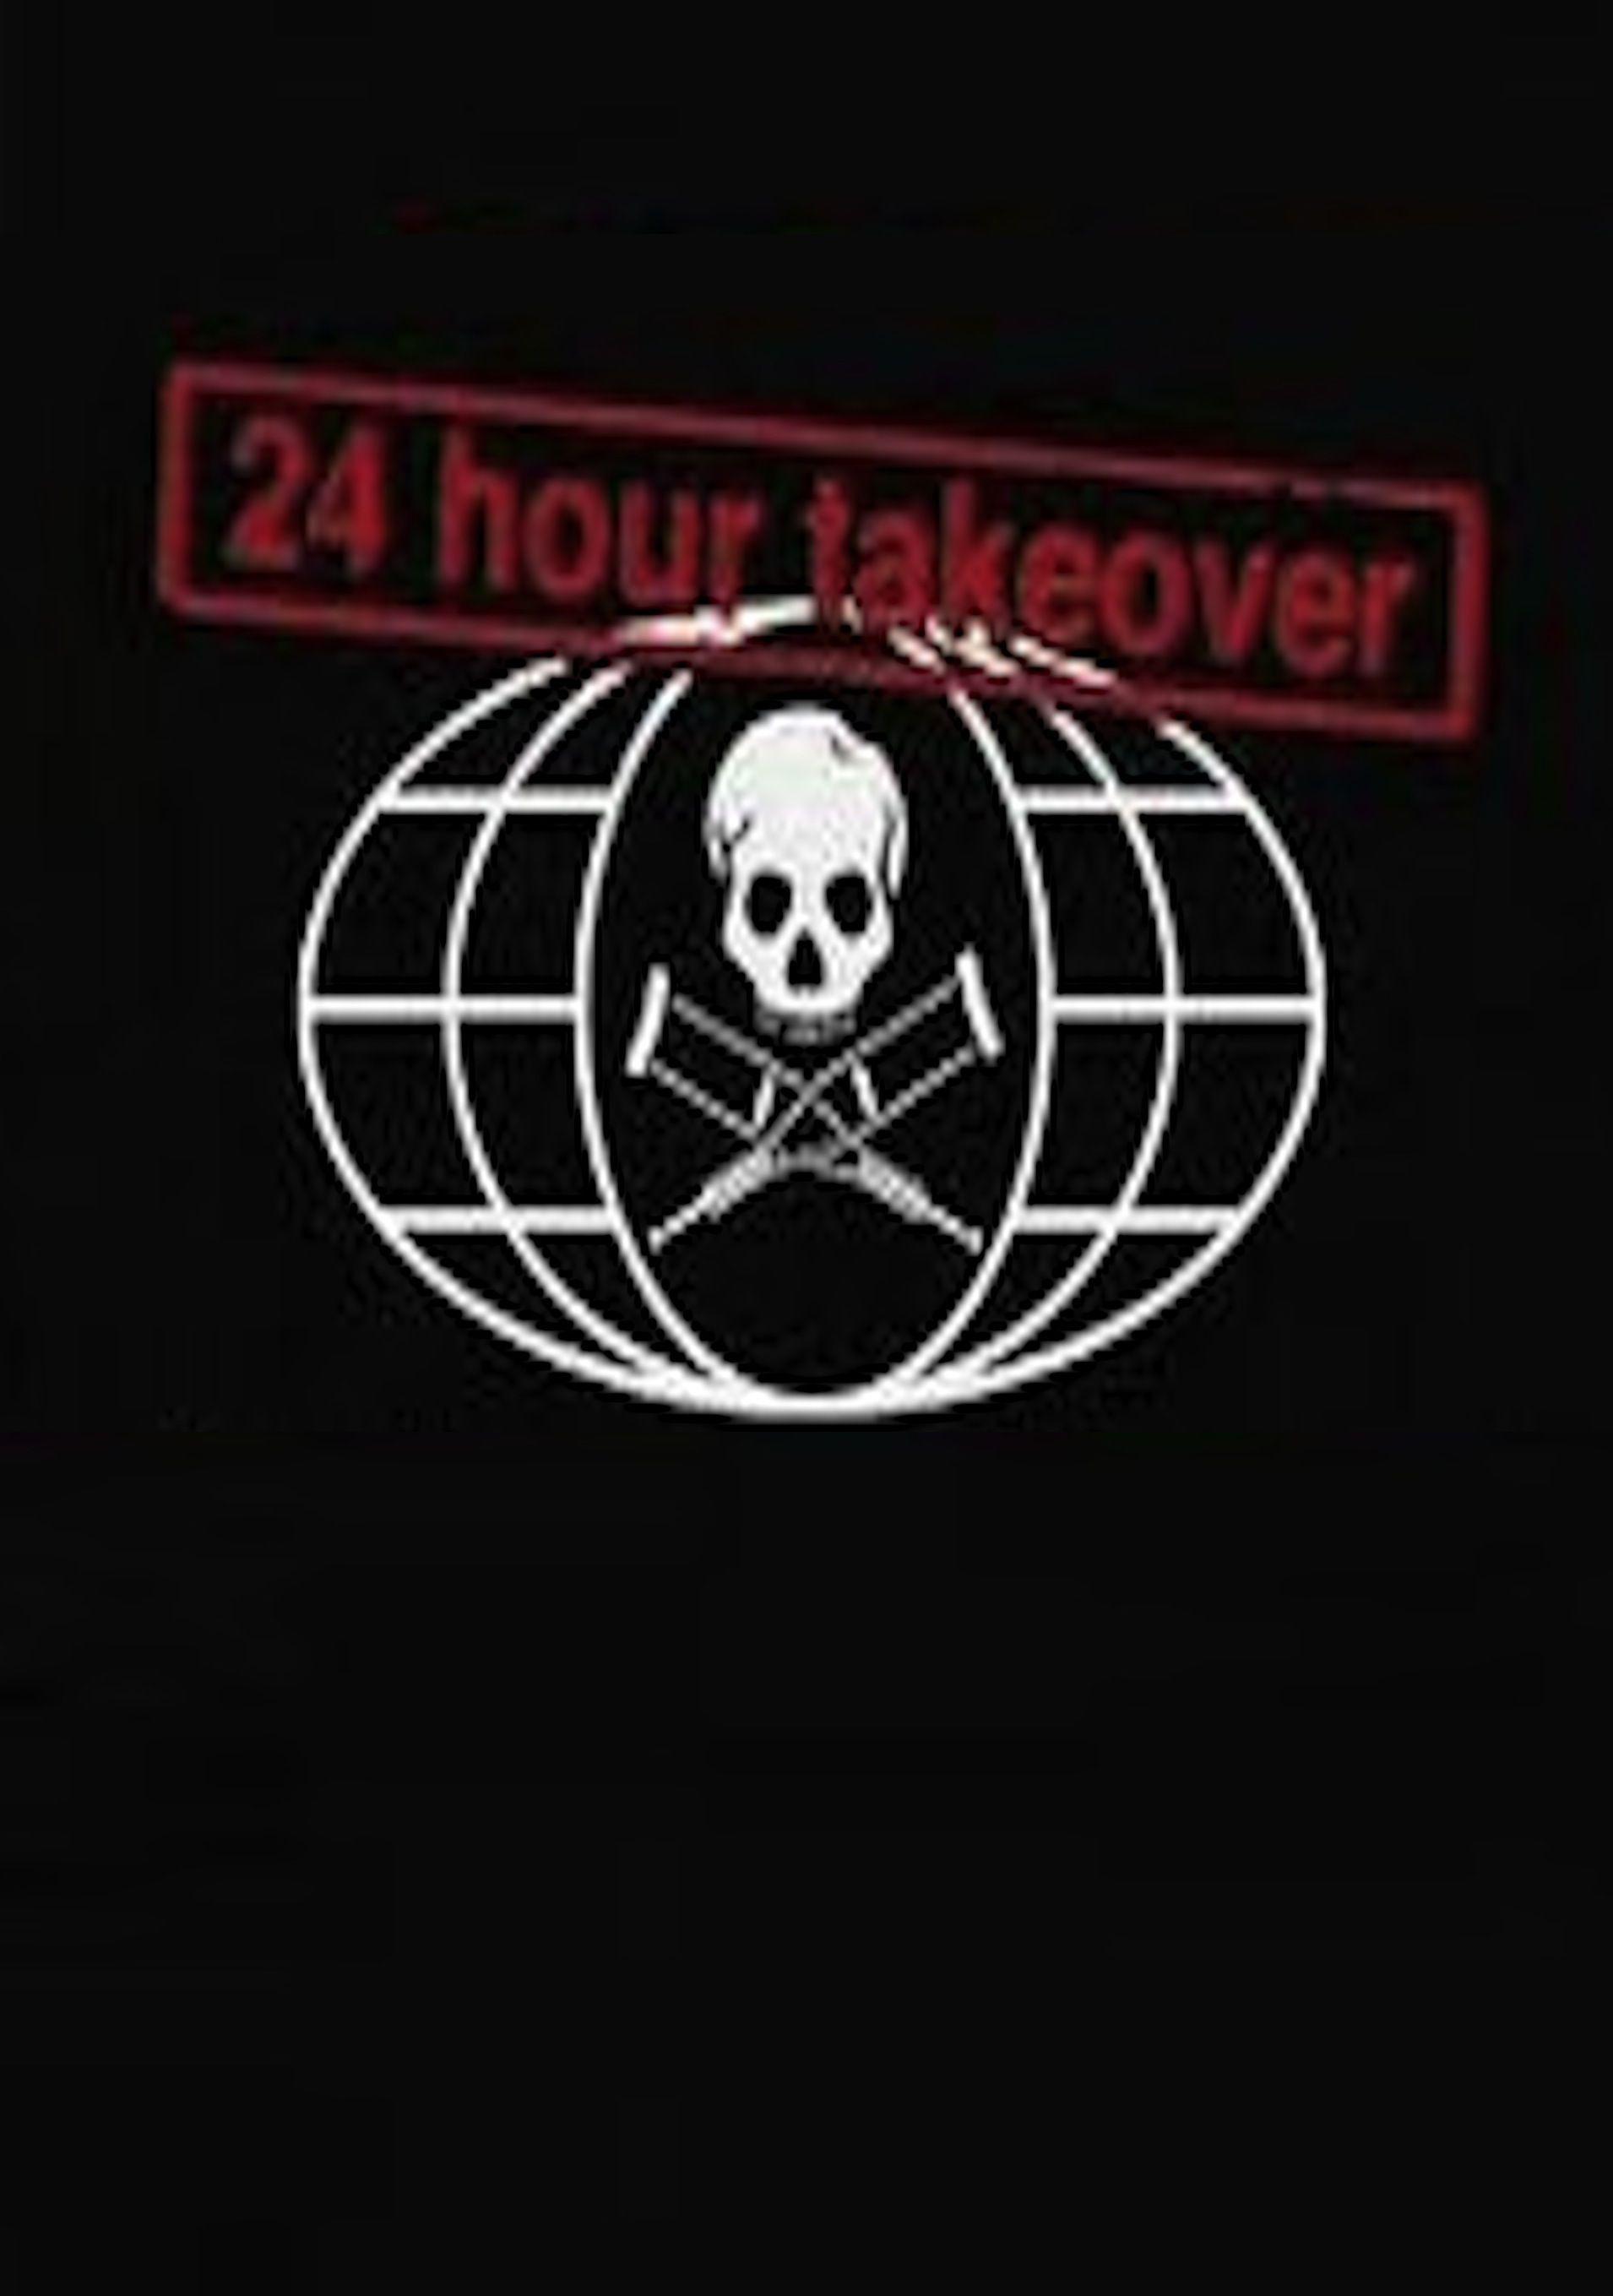 best of Hour Jack ass 24